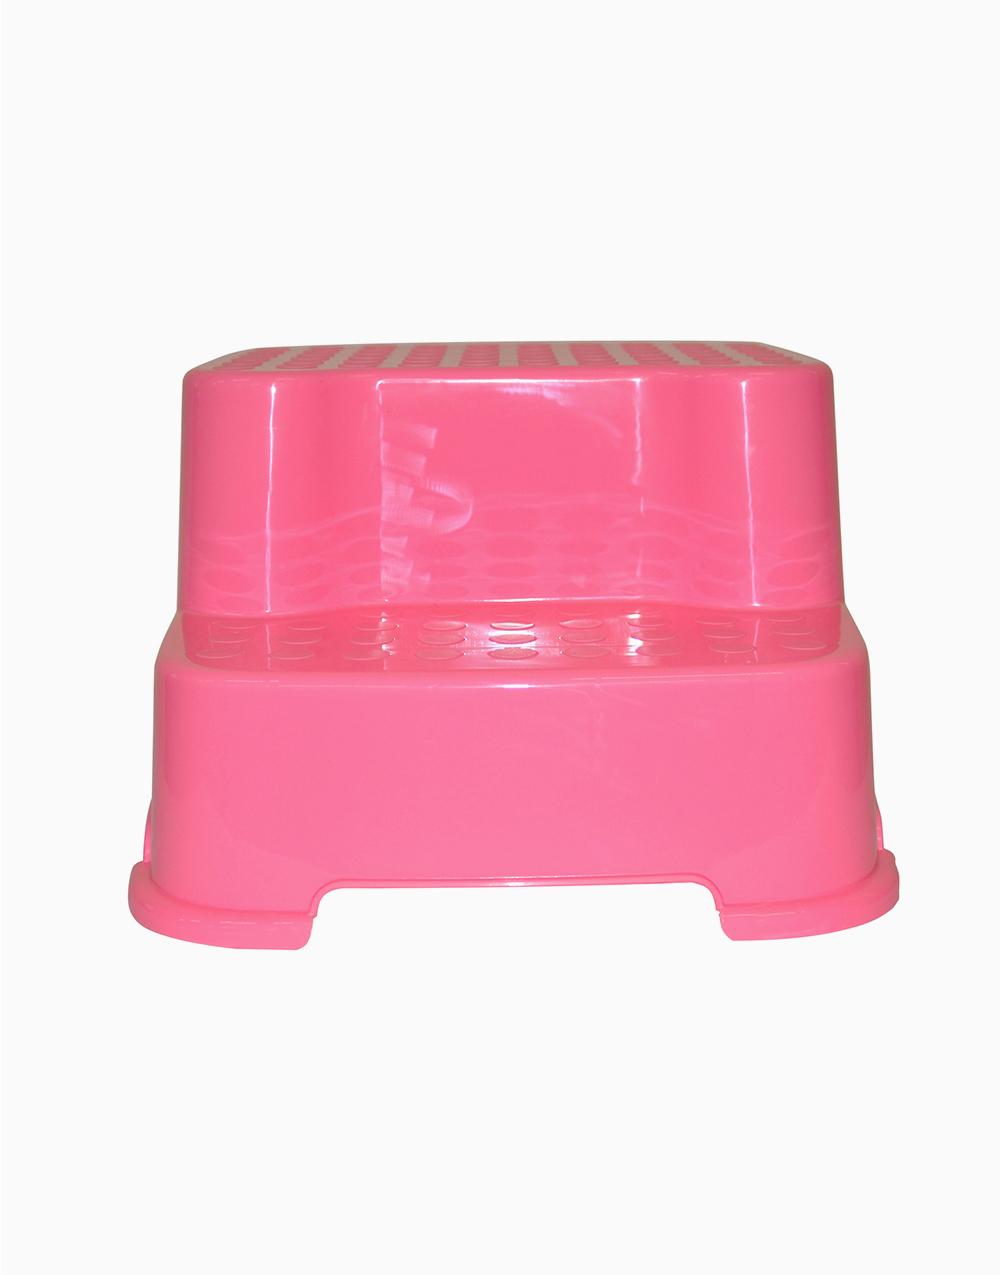 2-Step Stool by Babyhood   Pink